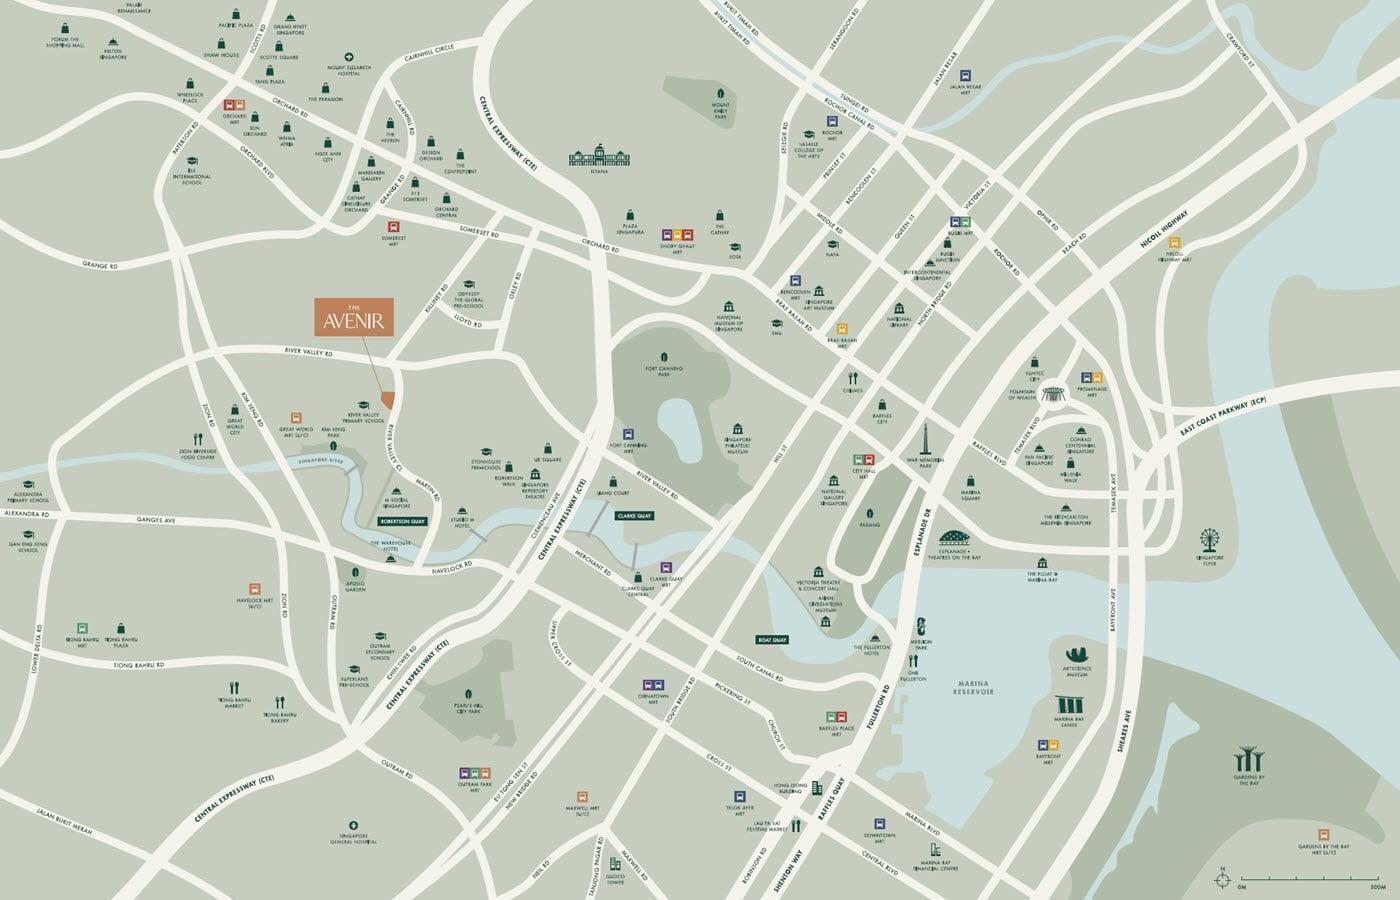 The Avenir - Location Map